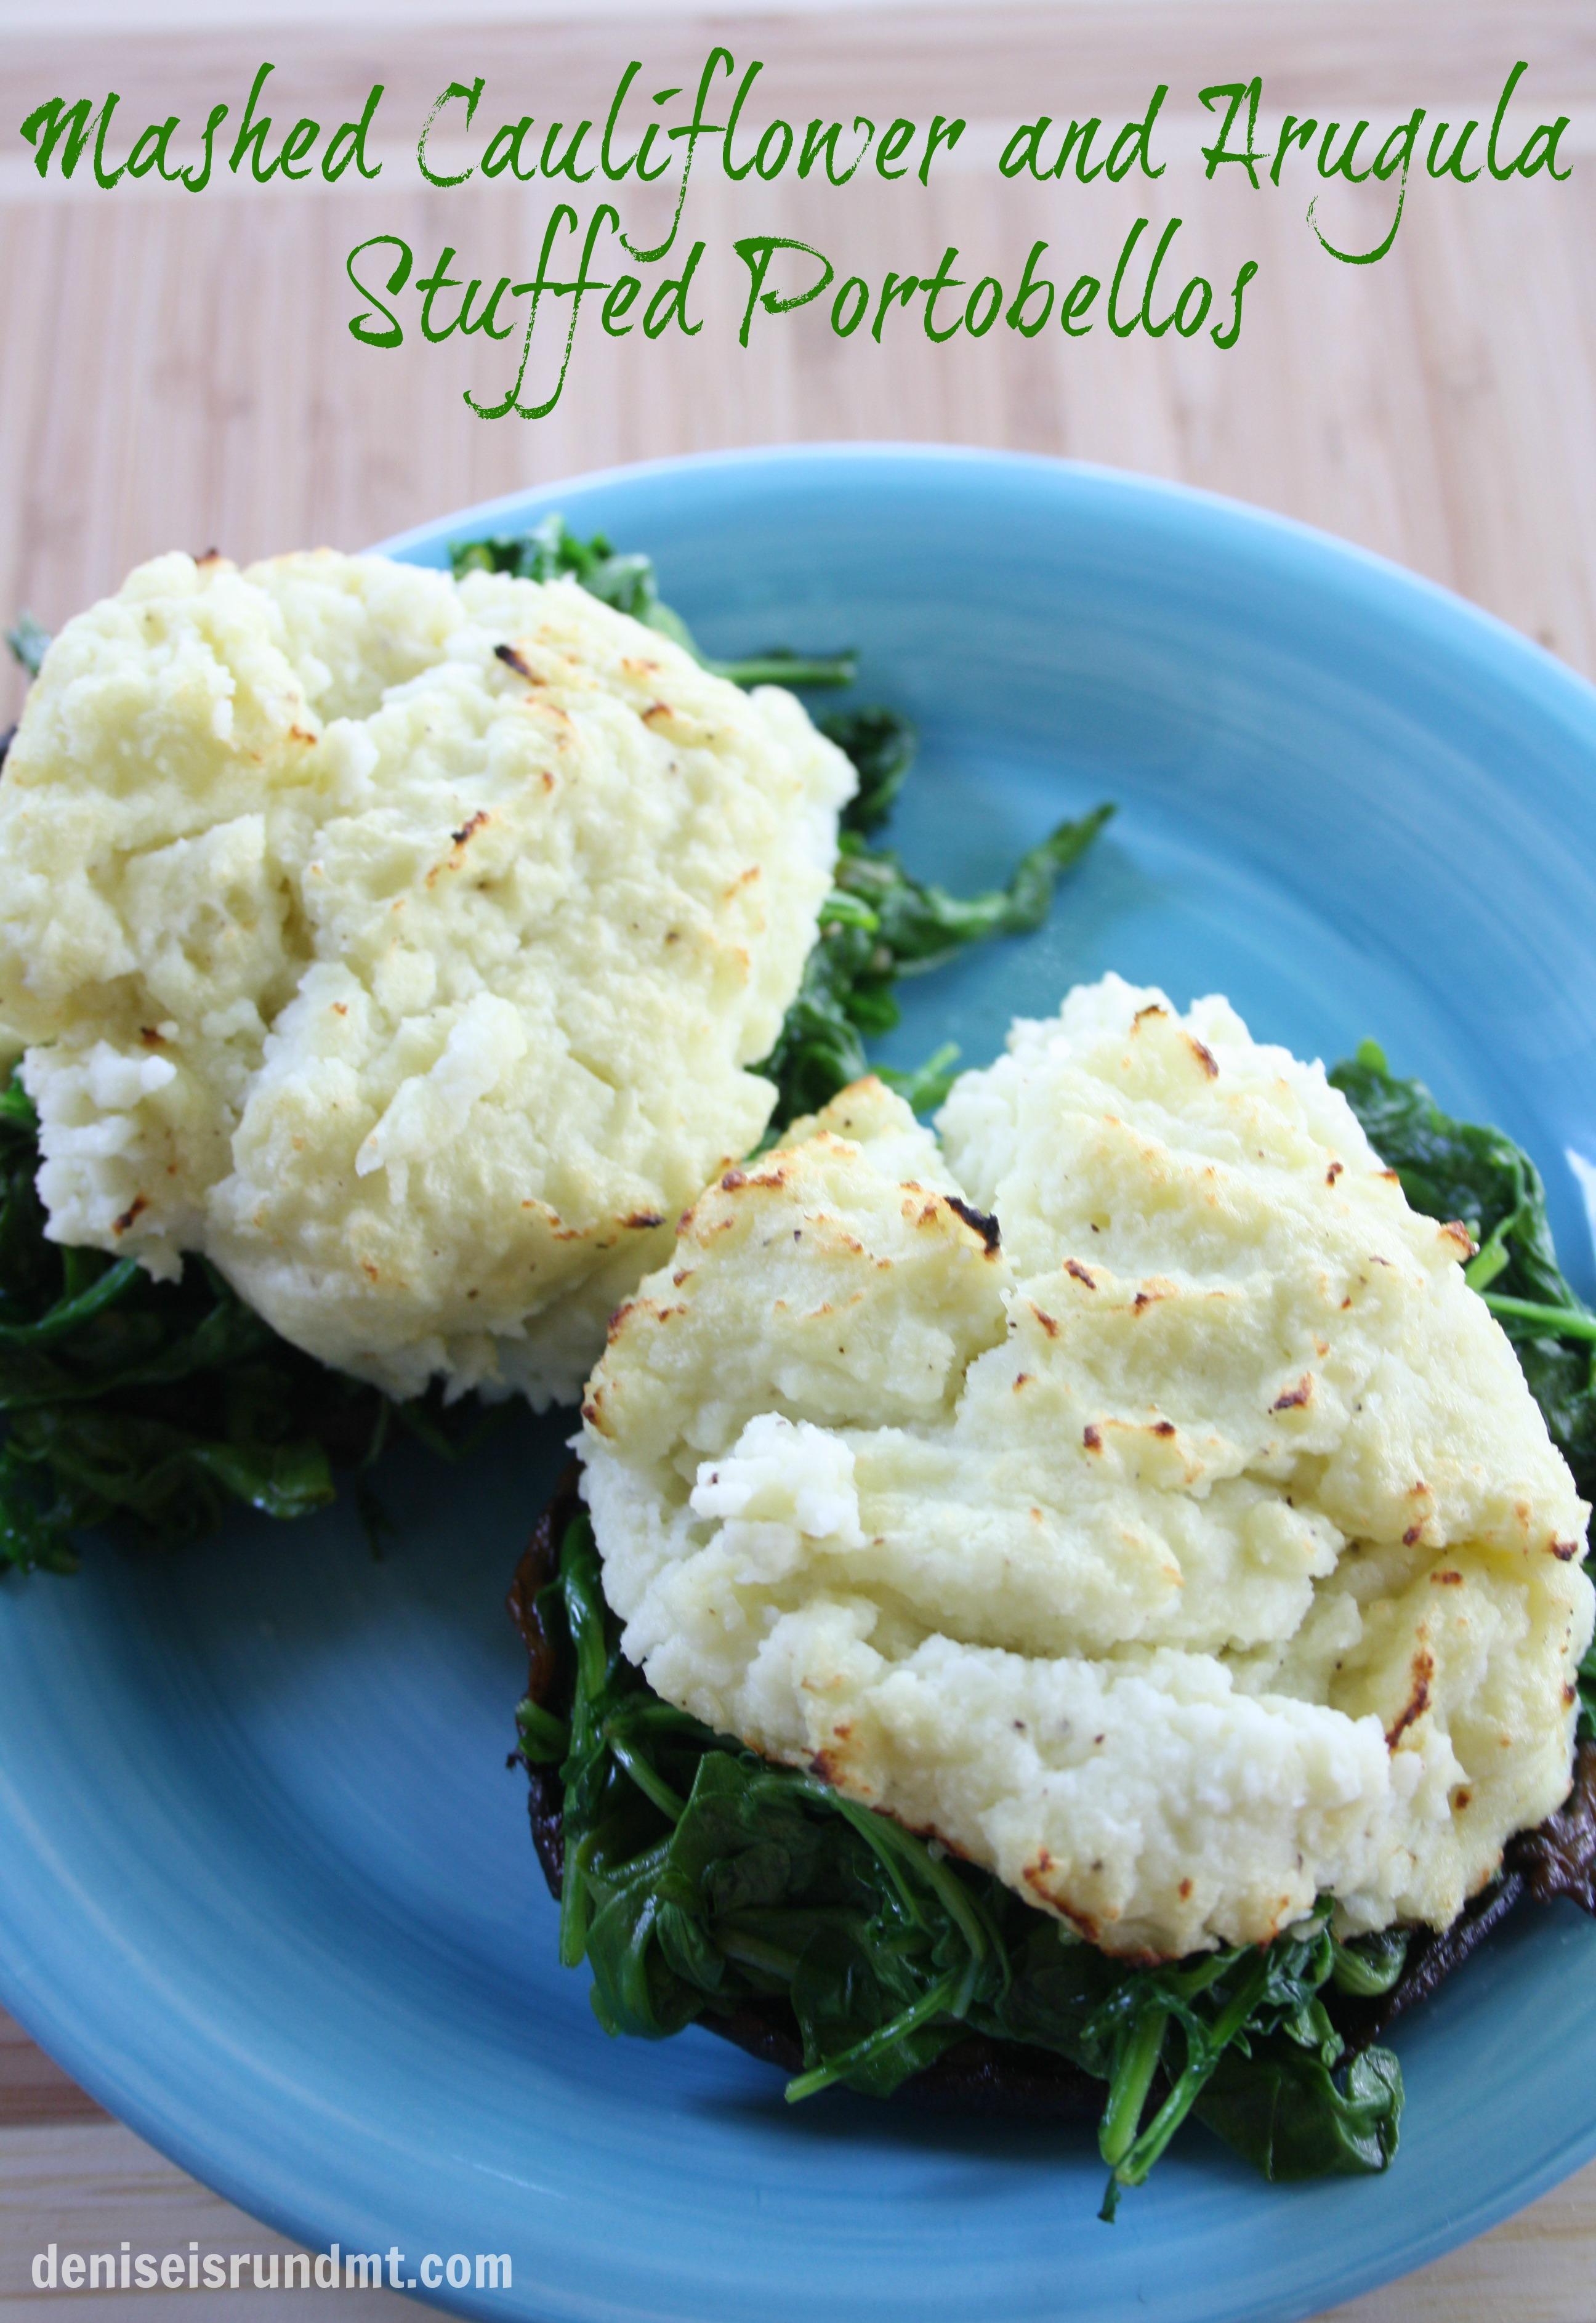 Mashed Cauliflower And Arugula Stuffed Portobellos